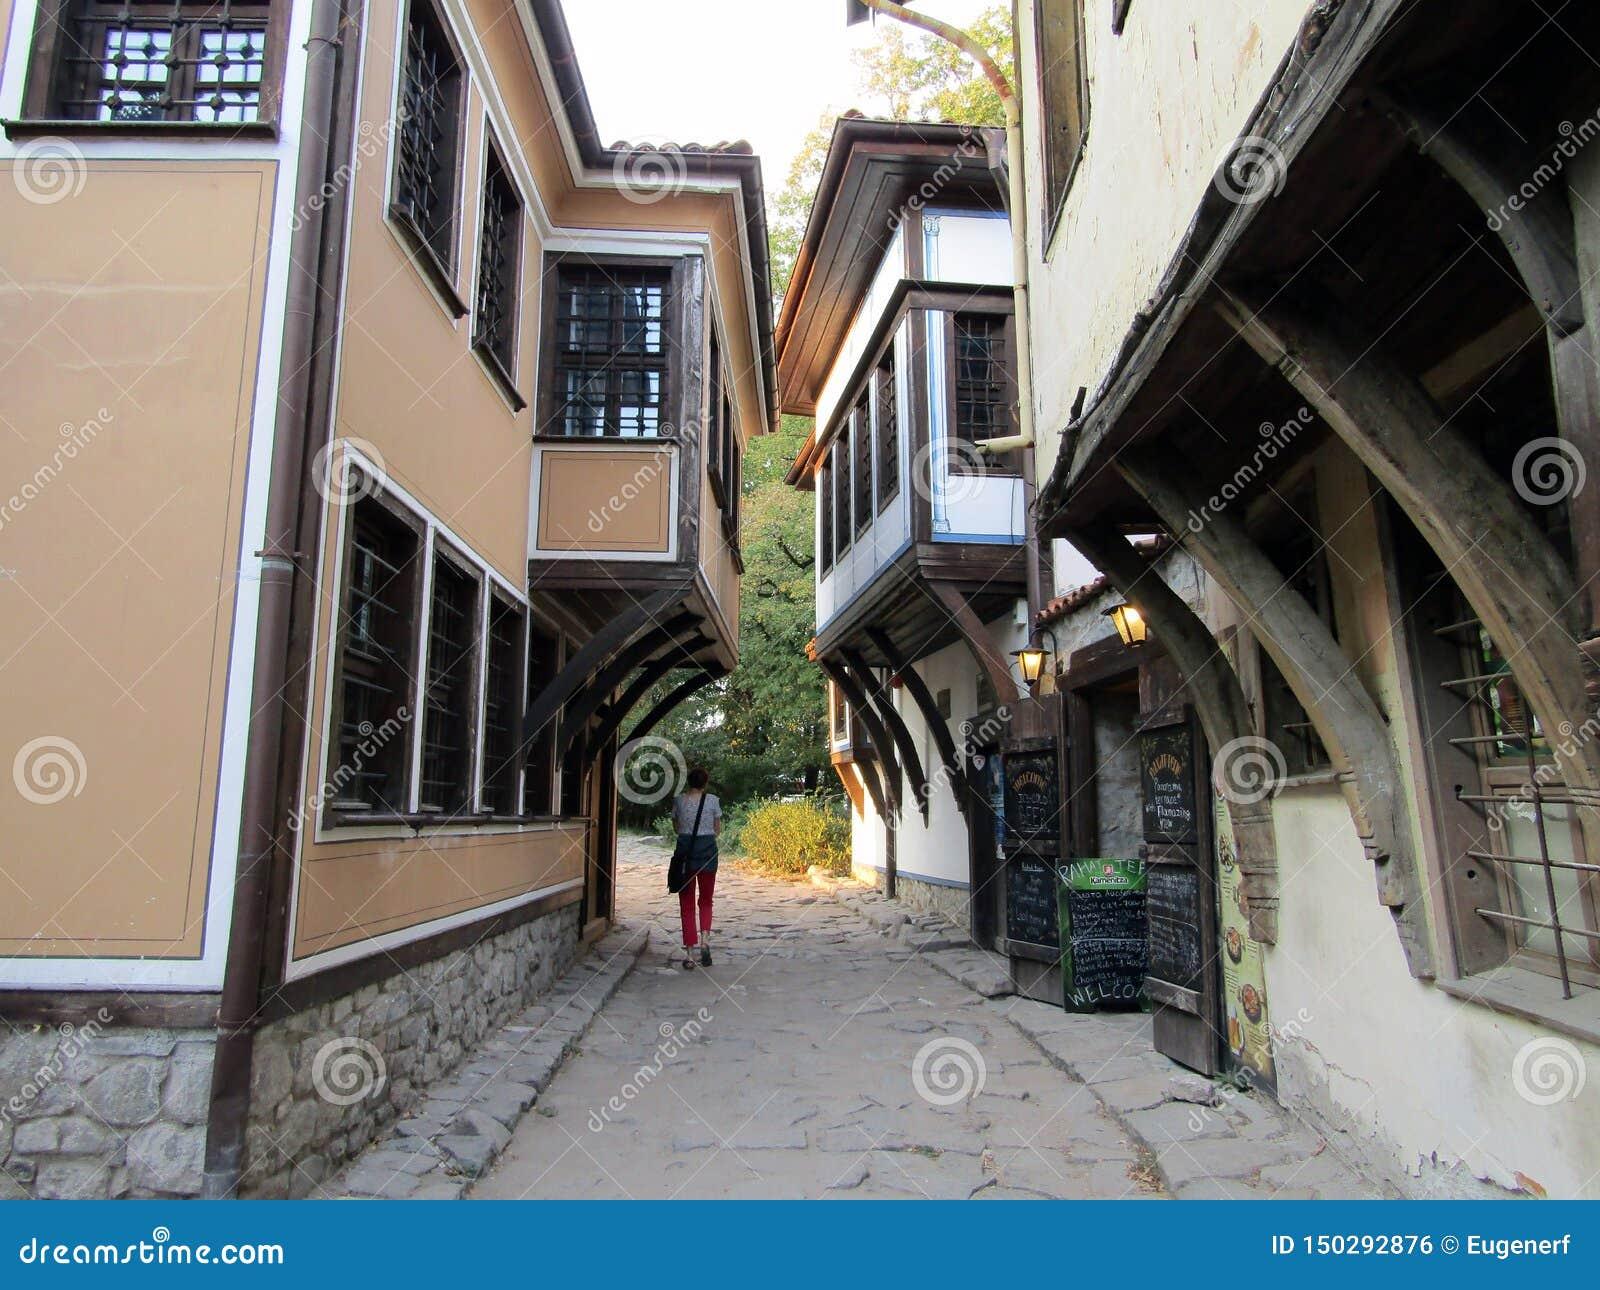 Old town narrow street